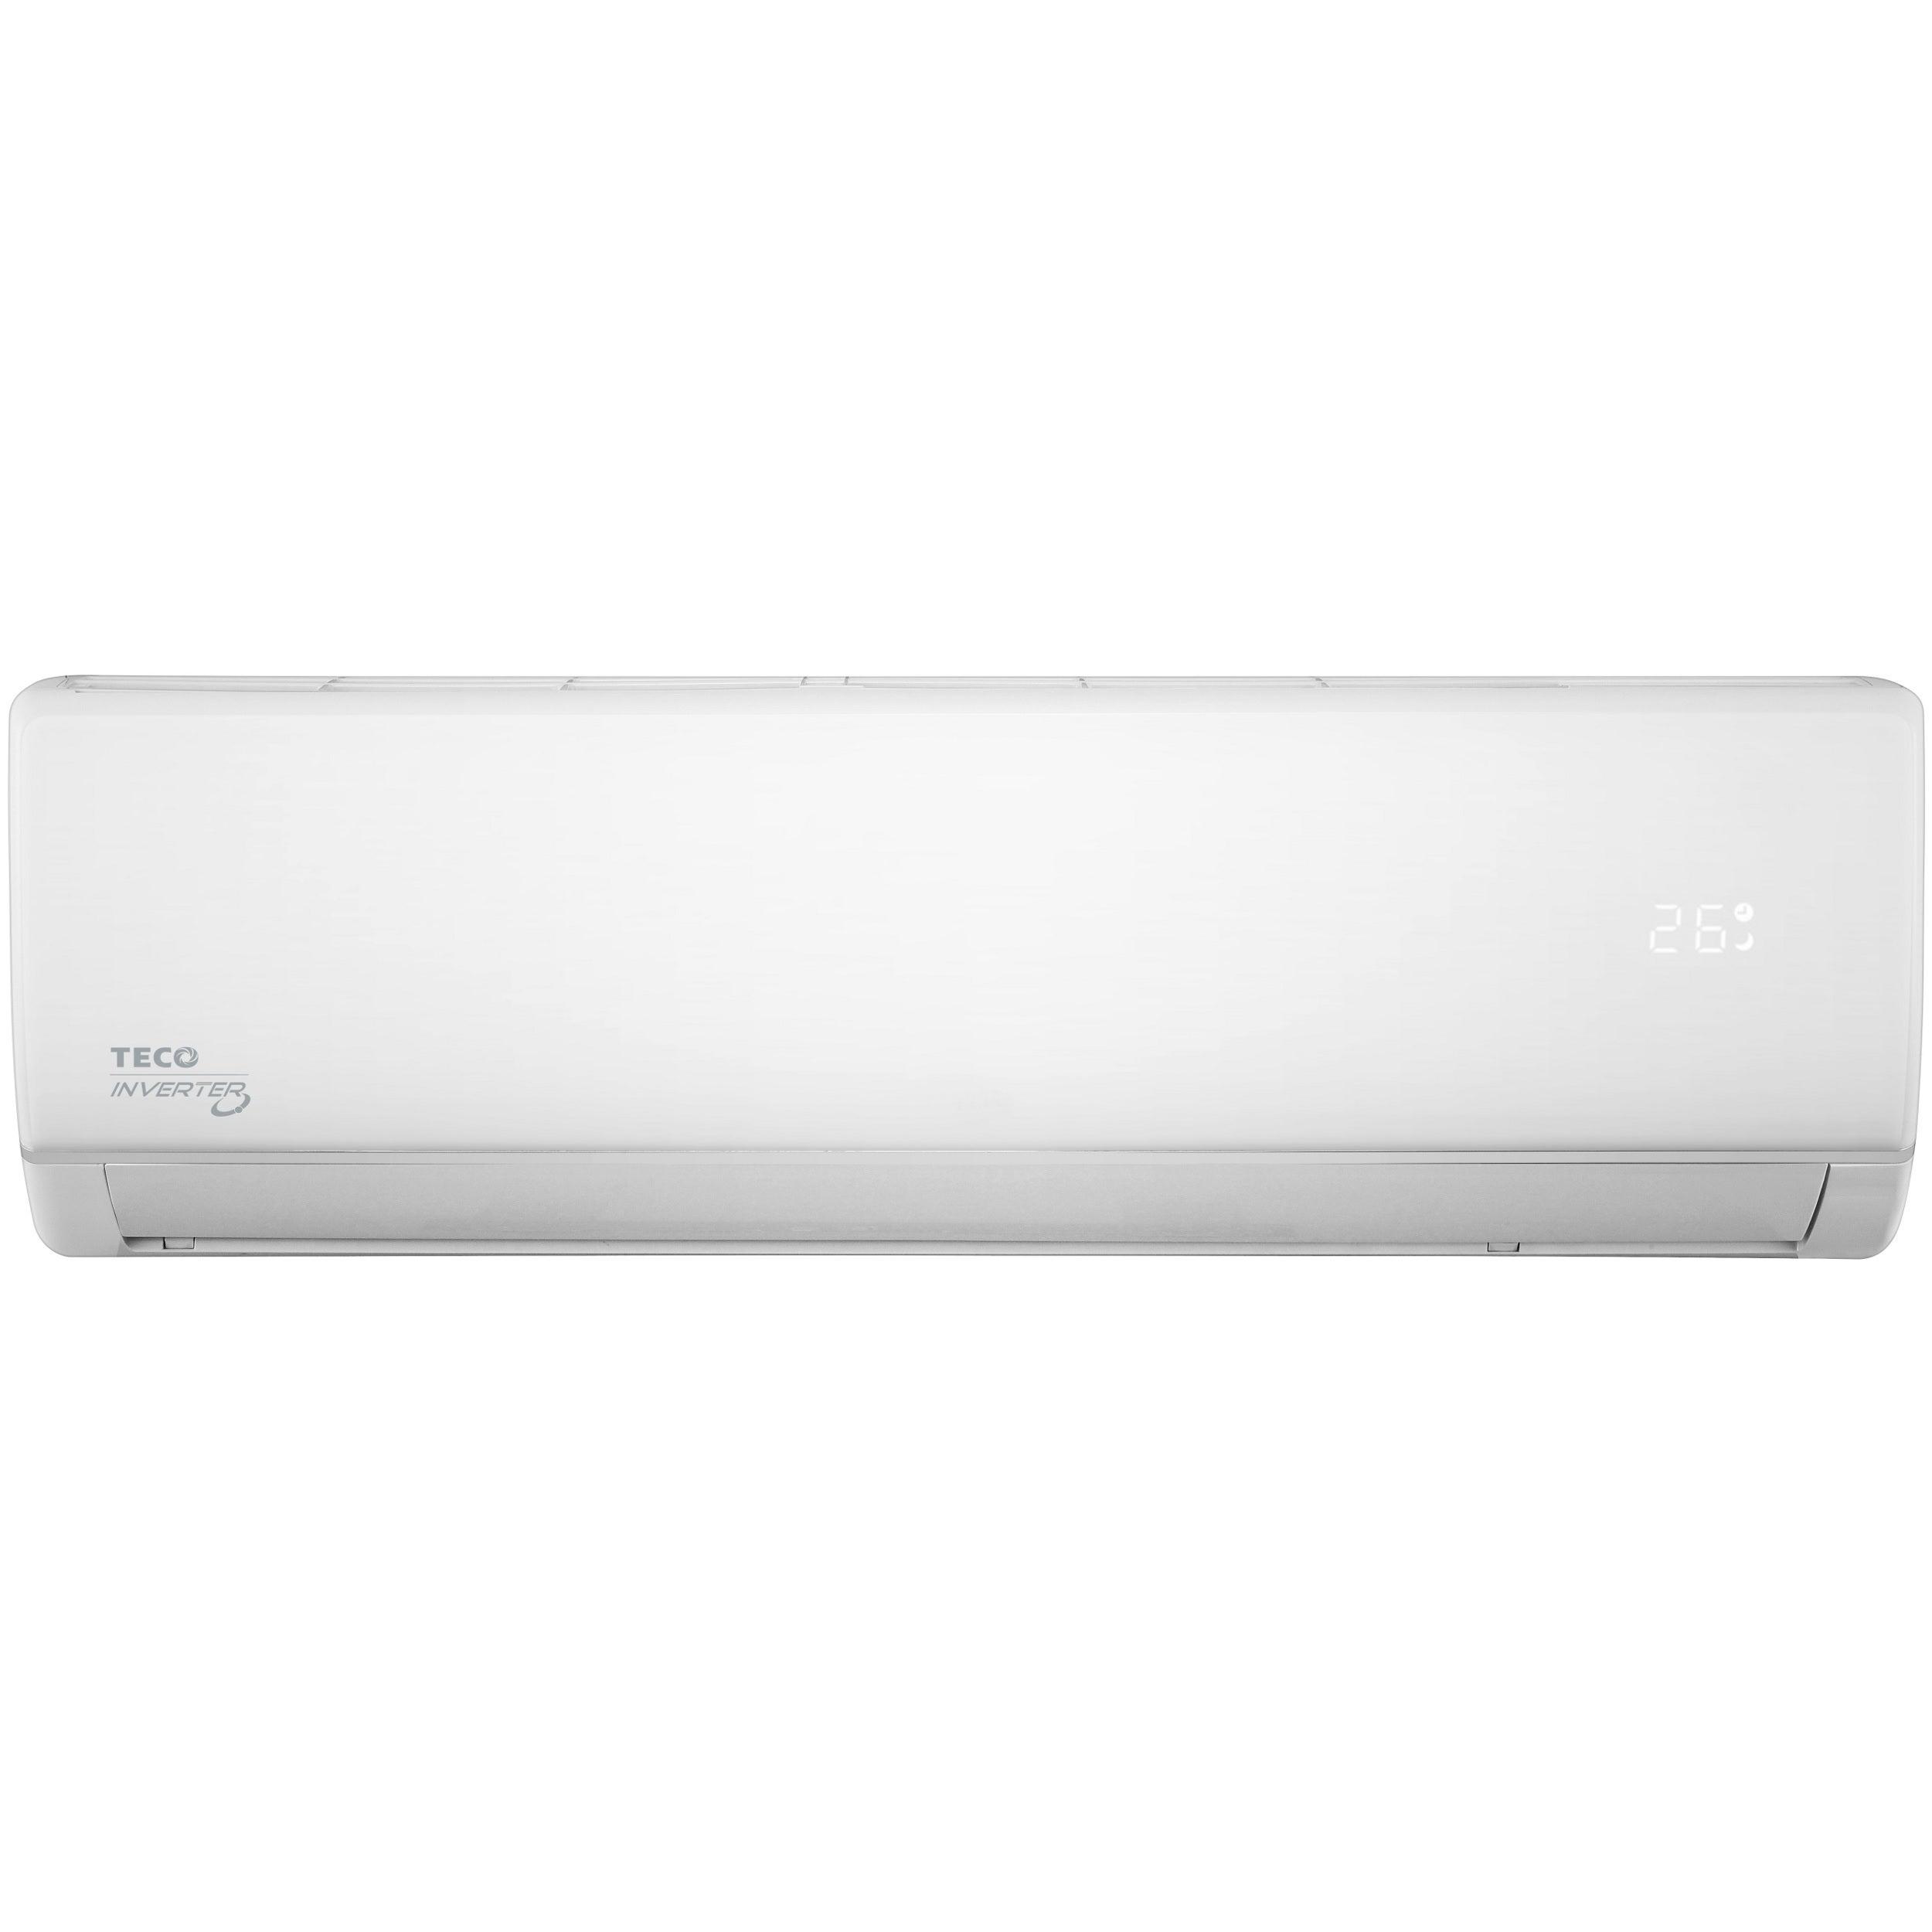 Teco TWS-TSO32HVHT Air Conditioner